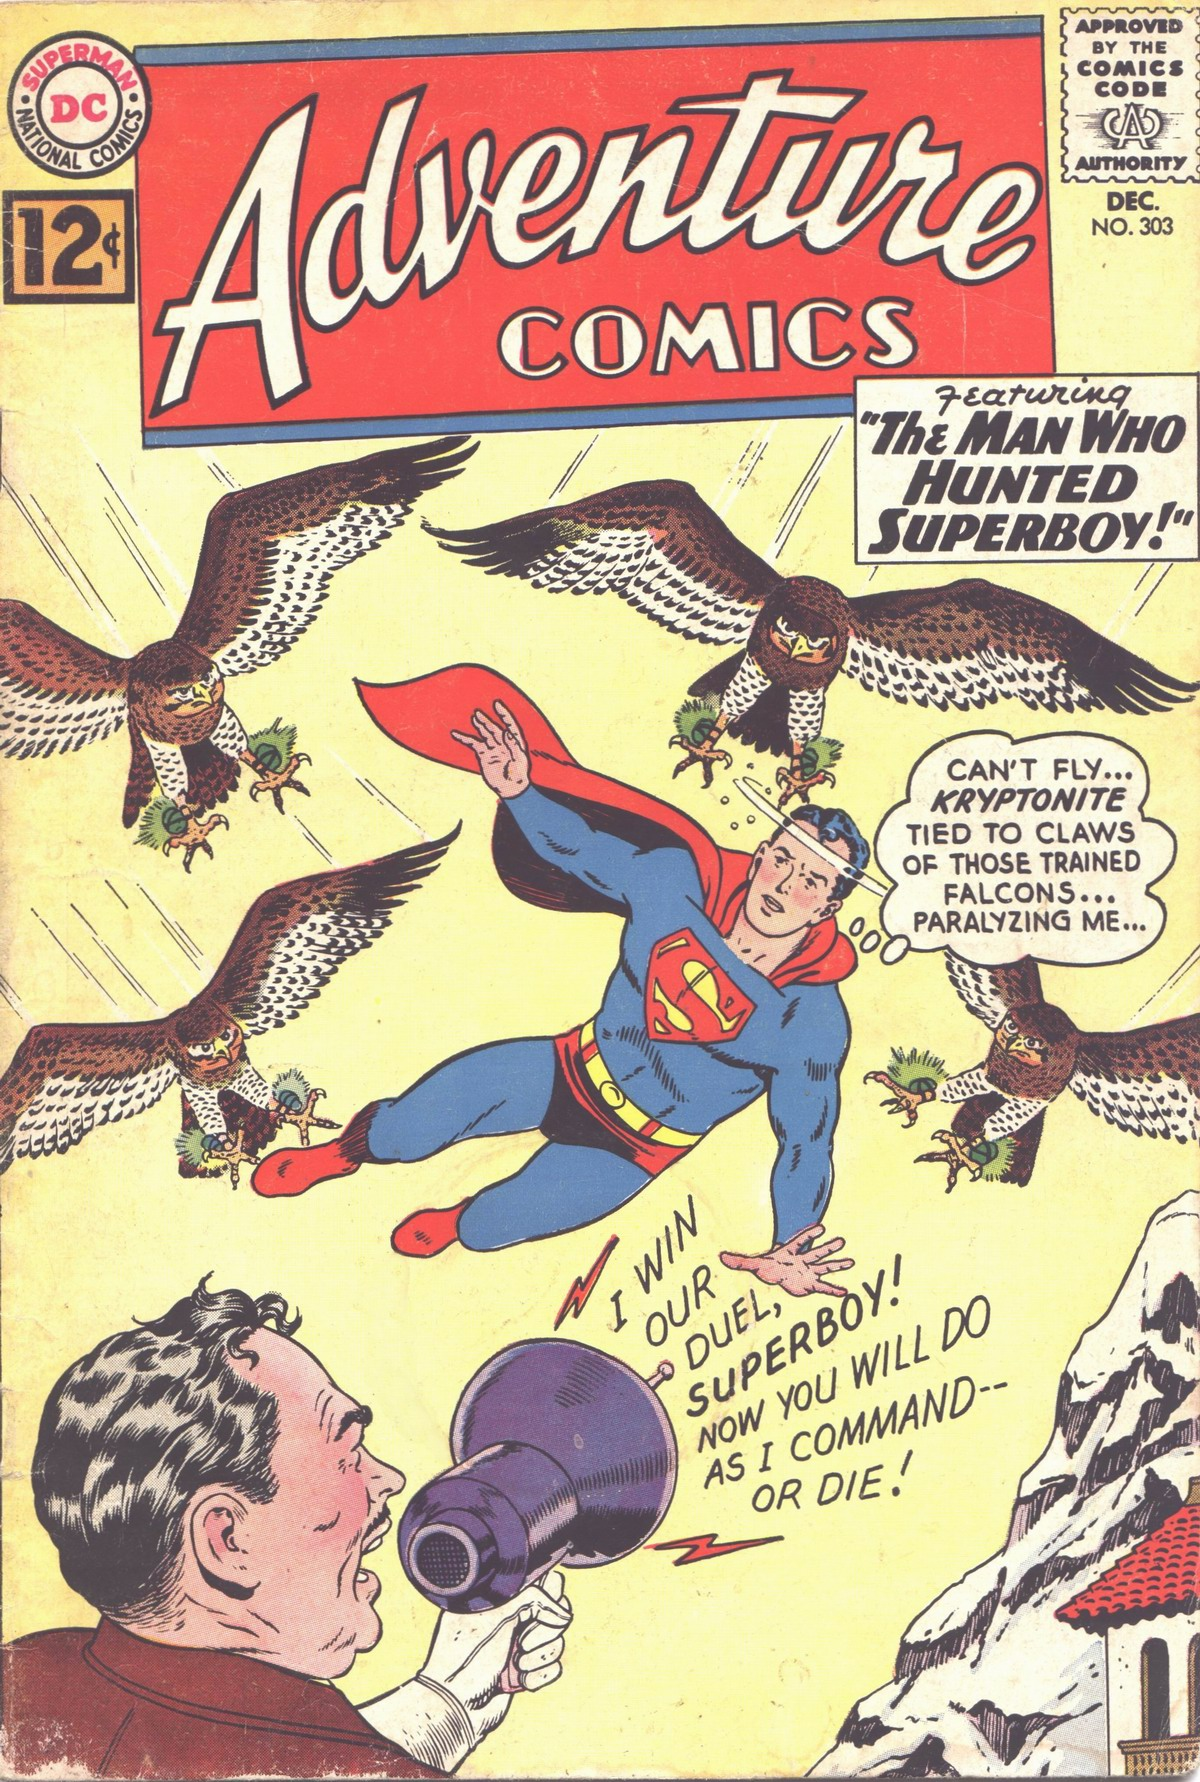 Read online Adventure Comics (1938) comic -  Issue #303 - 1